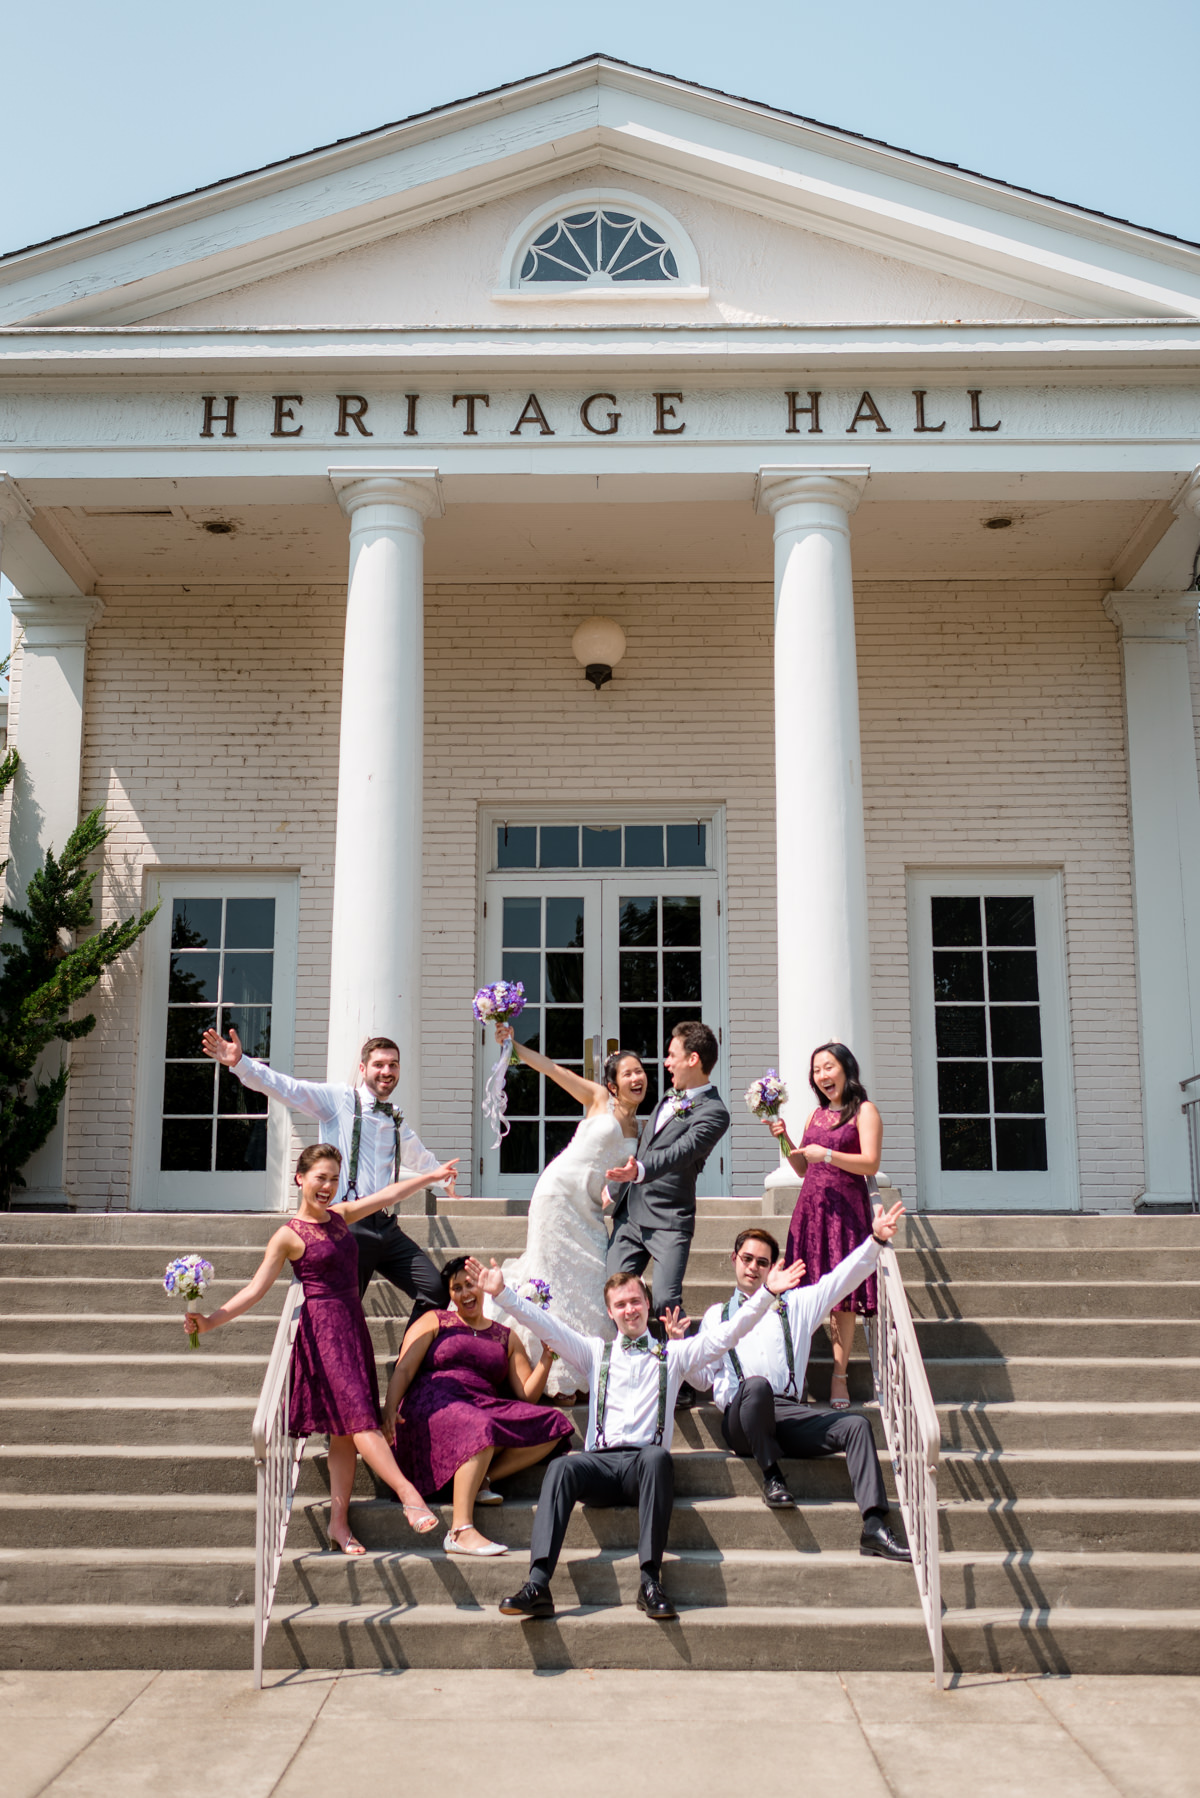 Andrew Tat - Documentary Wedding Photography - Heritage Hall - Kirkland, Washington - Grace & James - 20.JPG